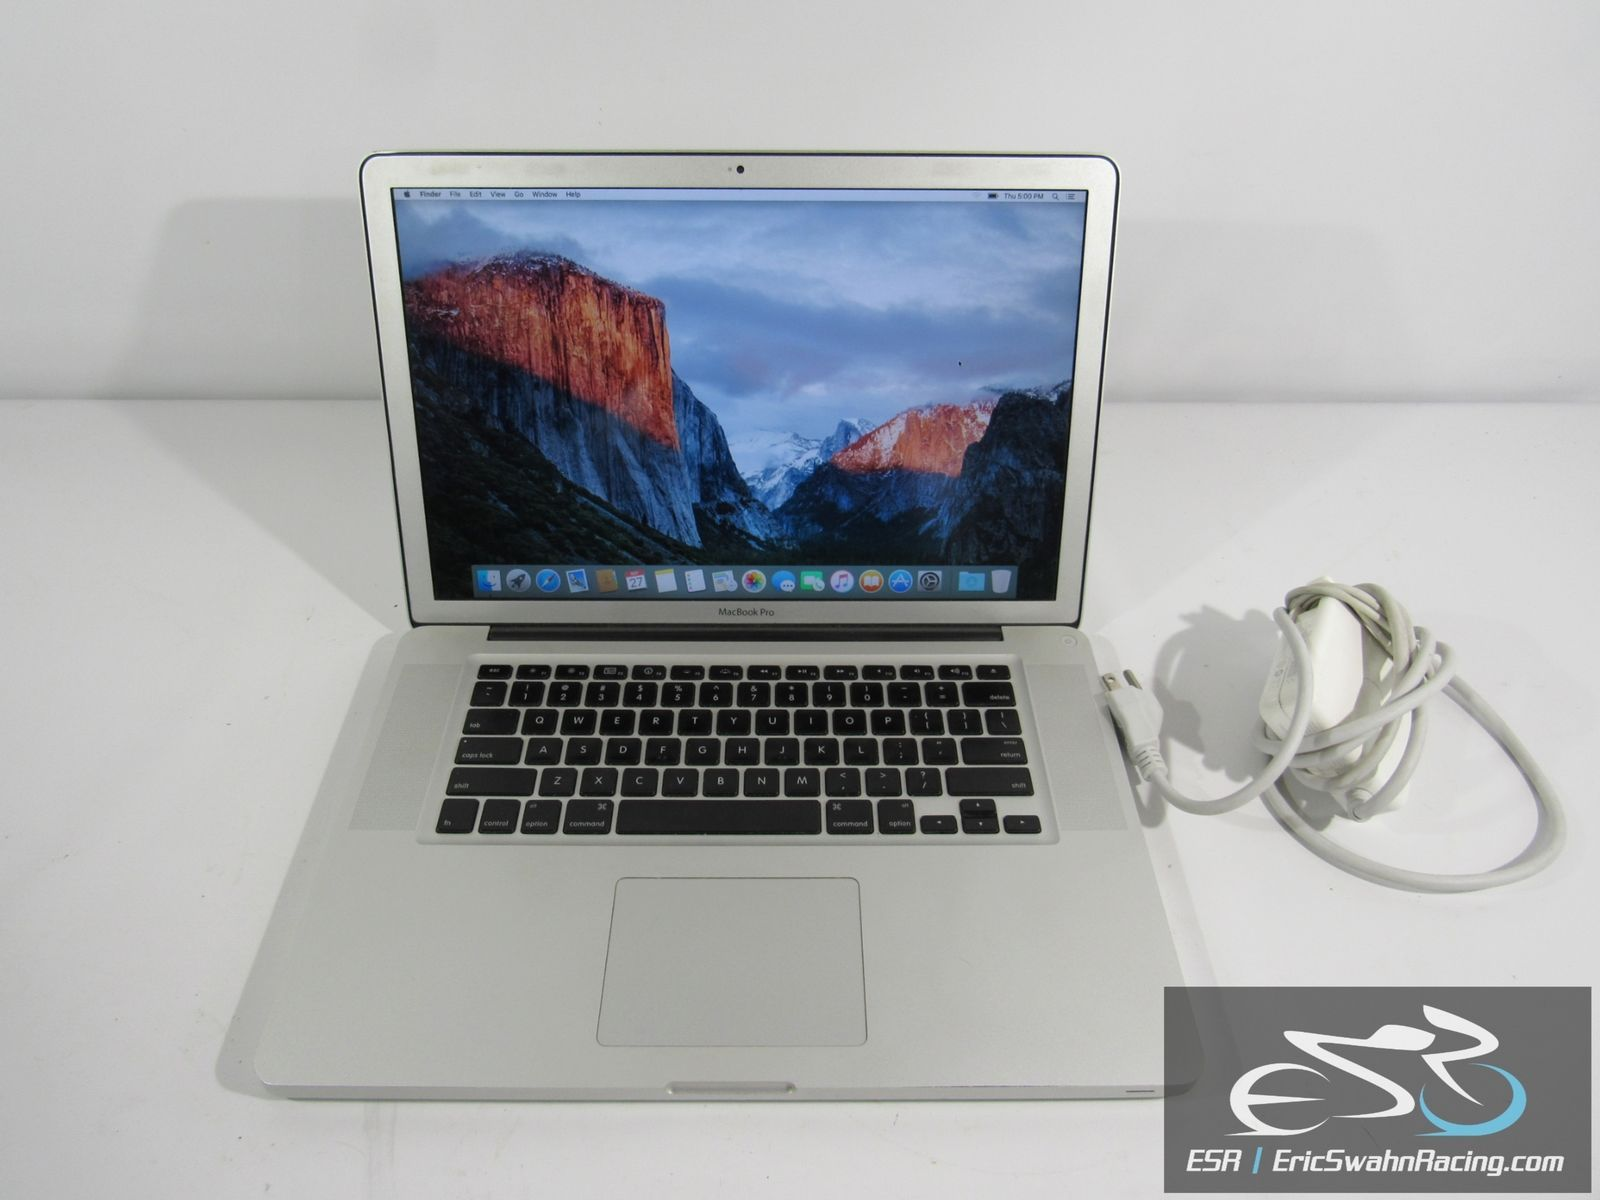 Apple Macbook Pro Intel Core 2d Uo 4gb Ram 2 8ghz 15 4 Display 500gb Hd Ebay Apple Laptop Laptop Electronic Products